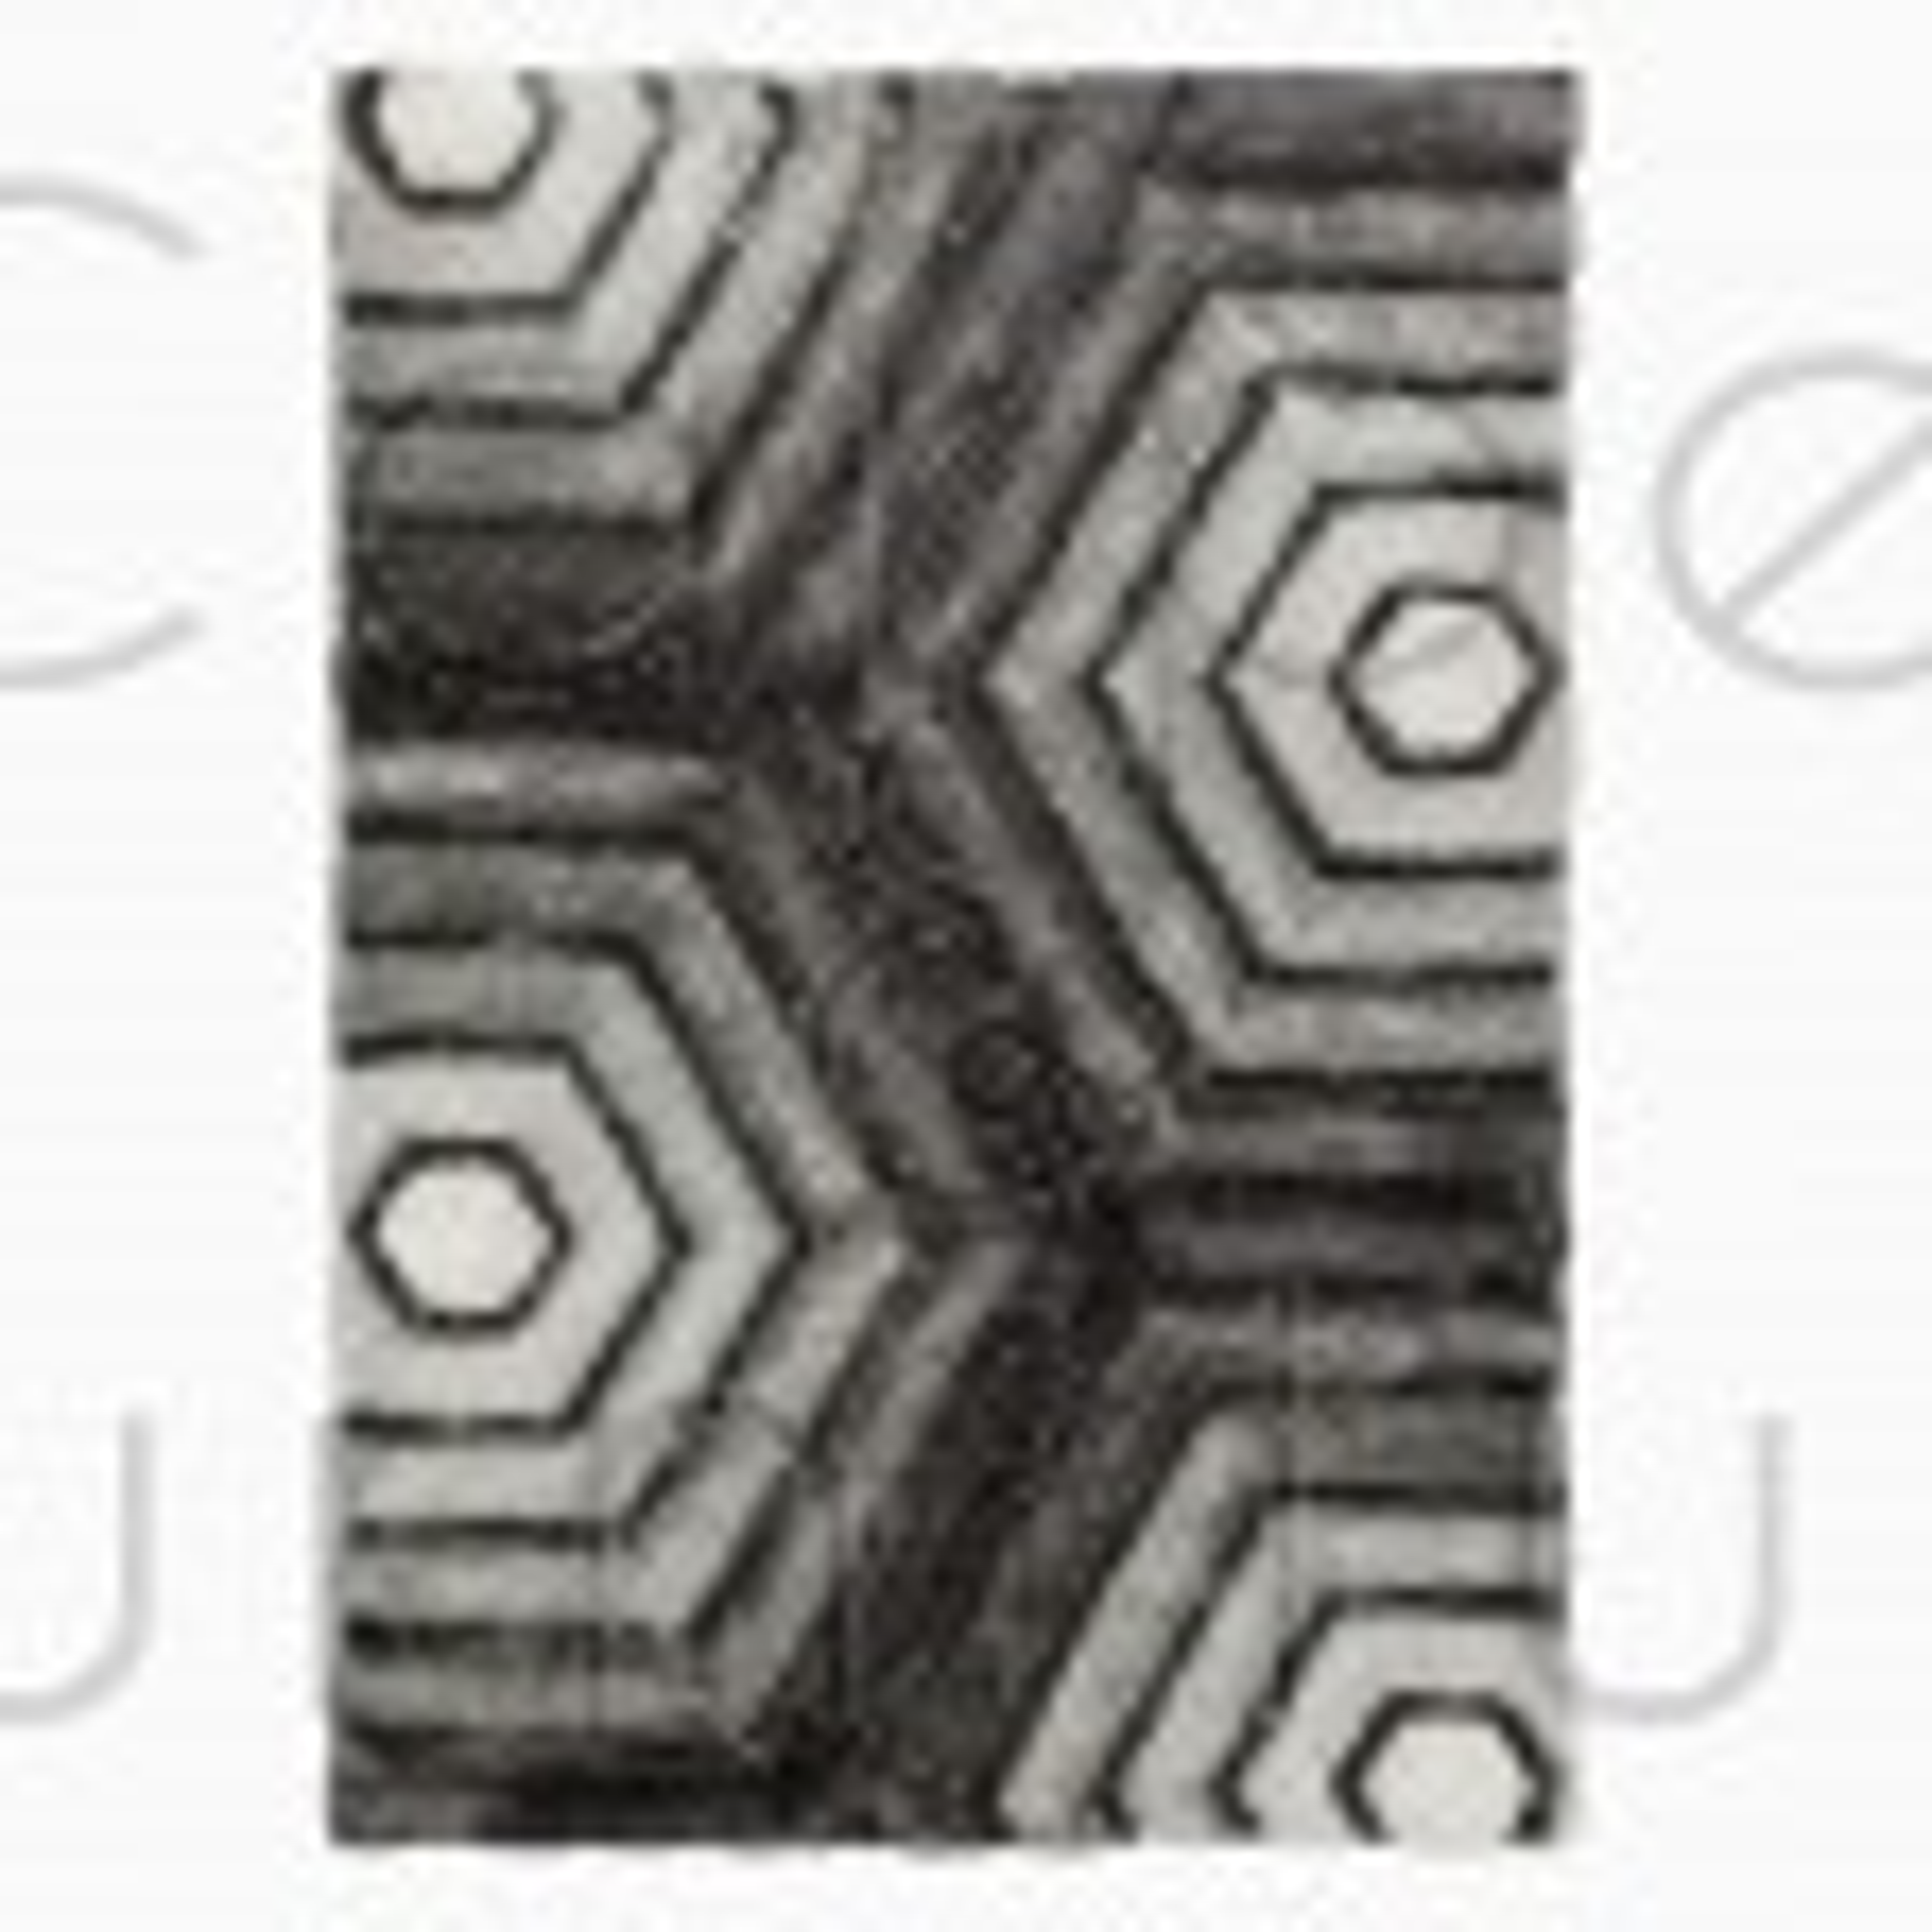 "Verge Hexagon Rug - Grey - Size 80 x 150 cm (2'8"" x 5')"